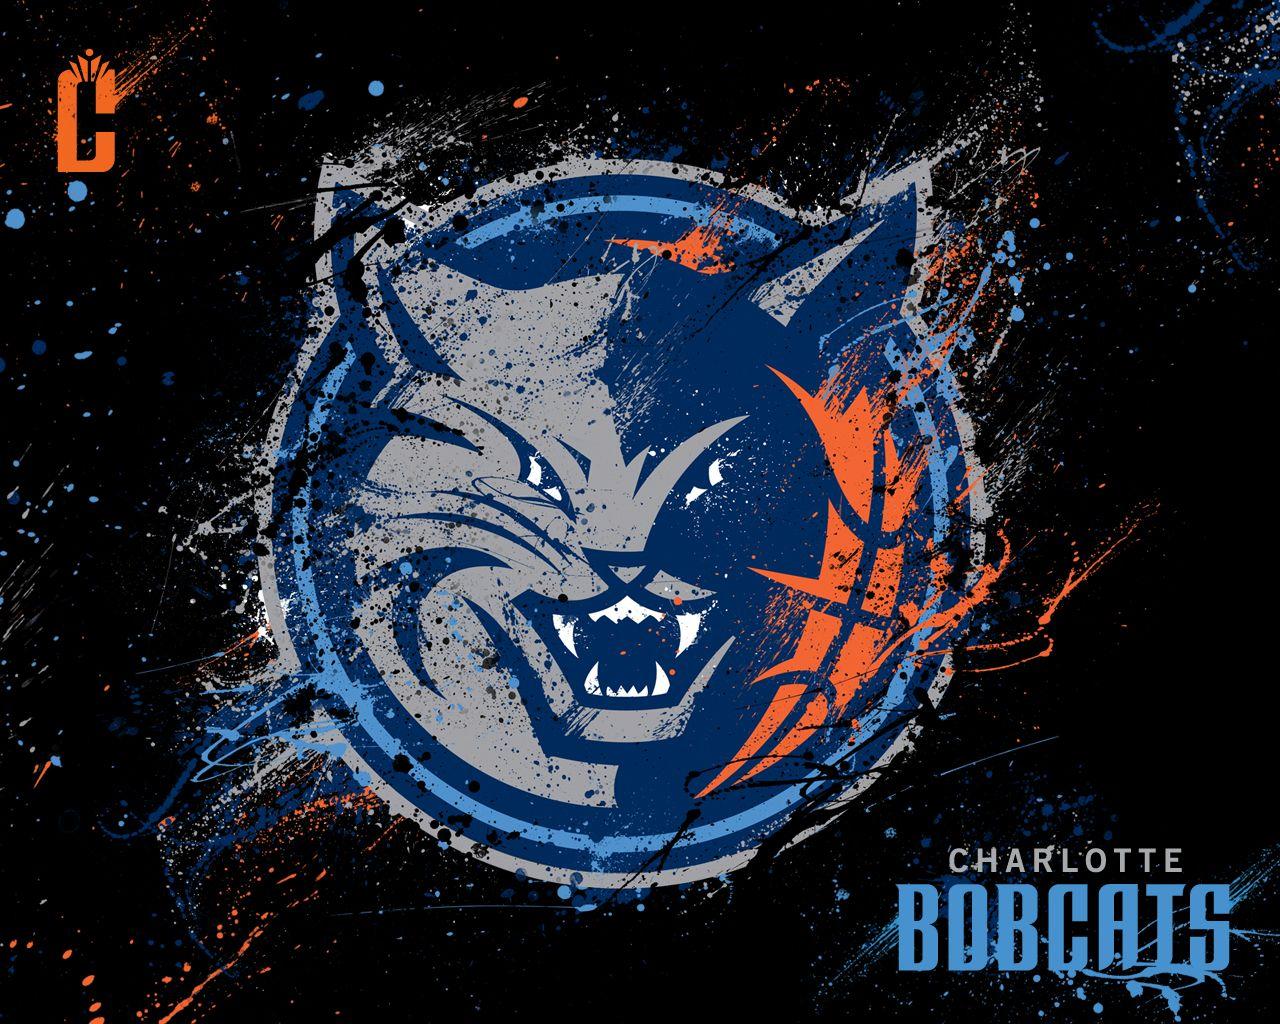 Charlotte Bobcats Logo Charlotte Bobcats